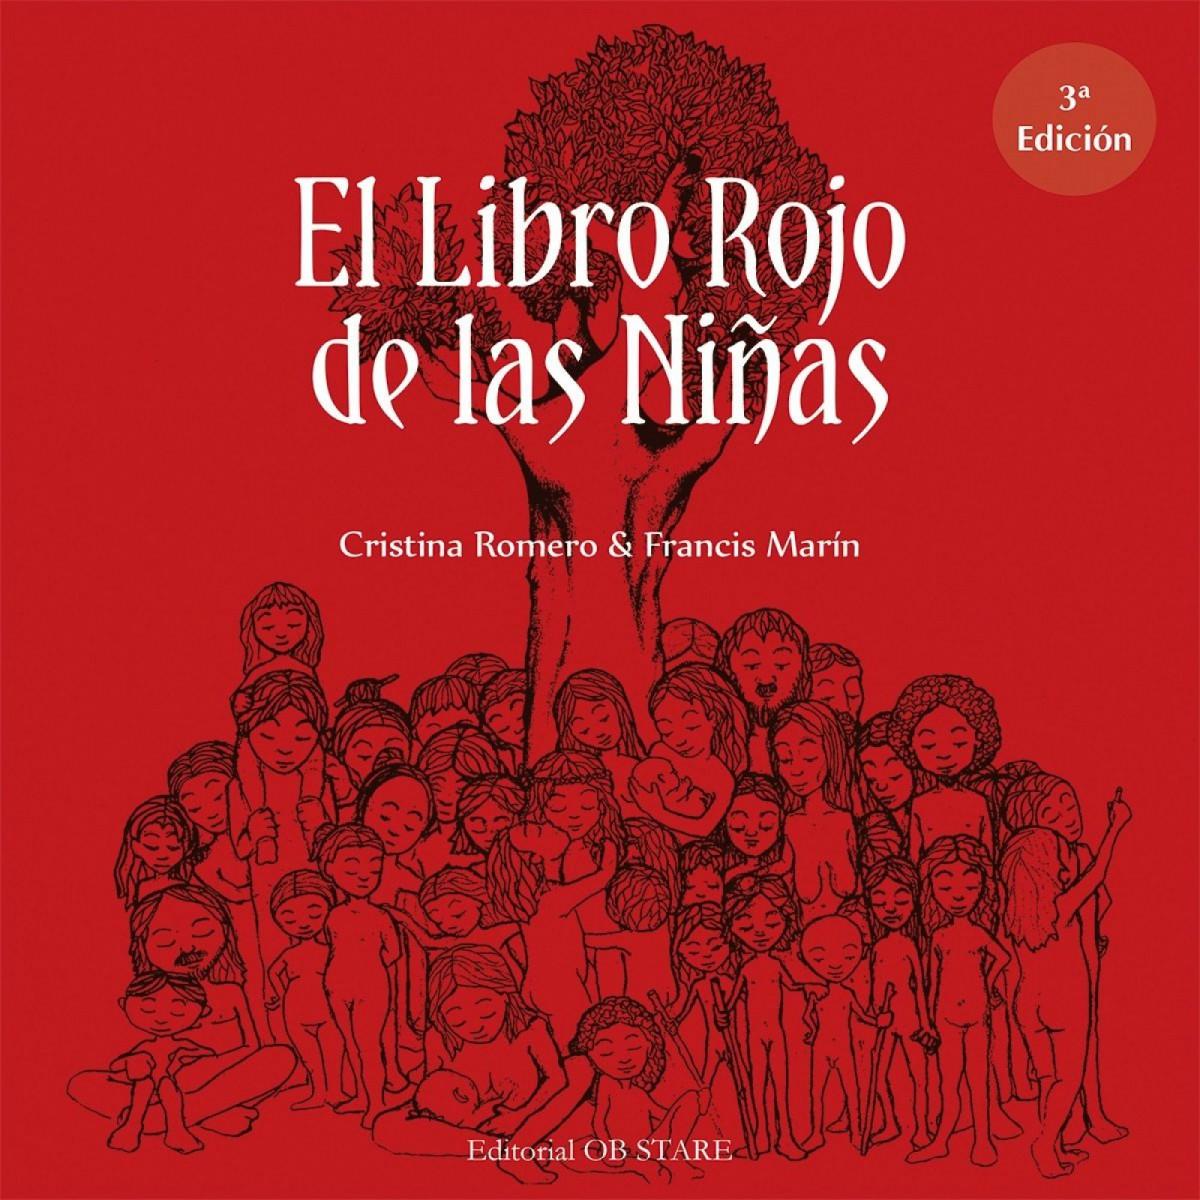 El libro rojo de las niñas de Cristina Romero.